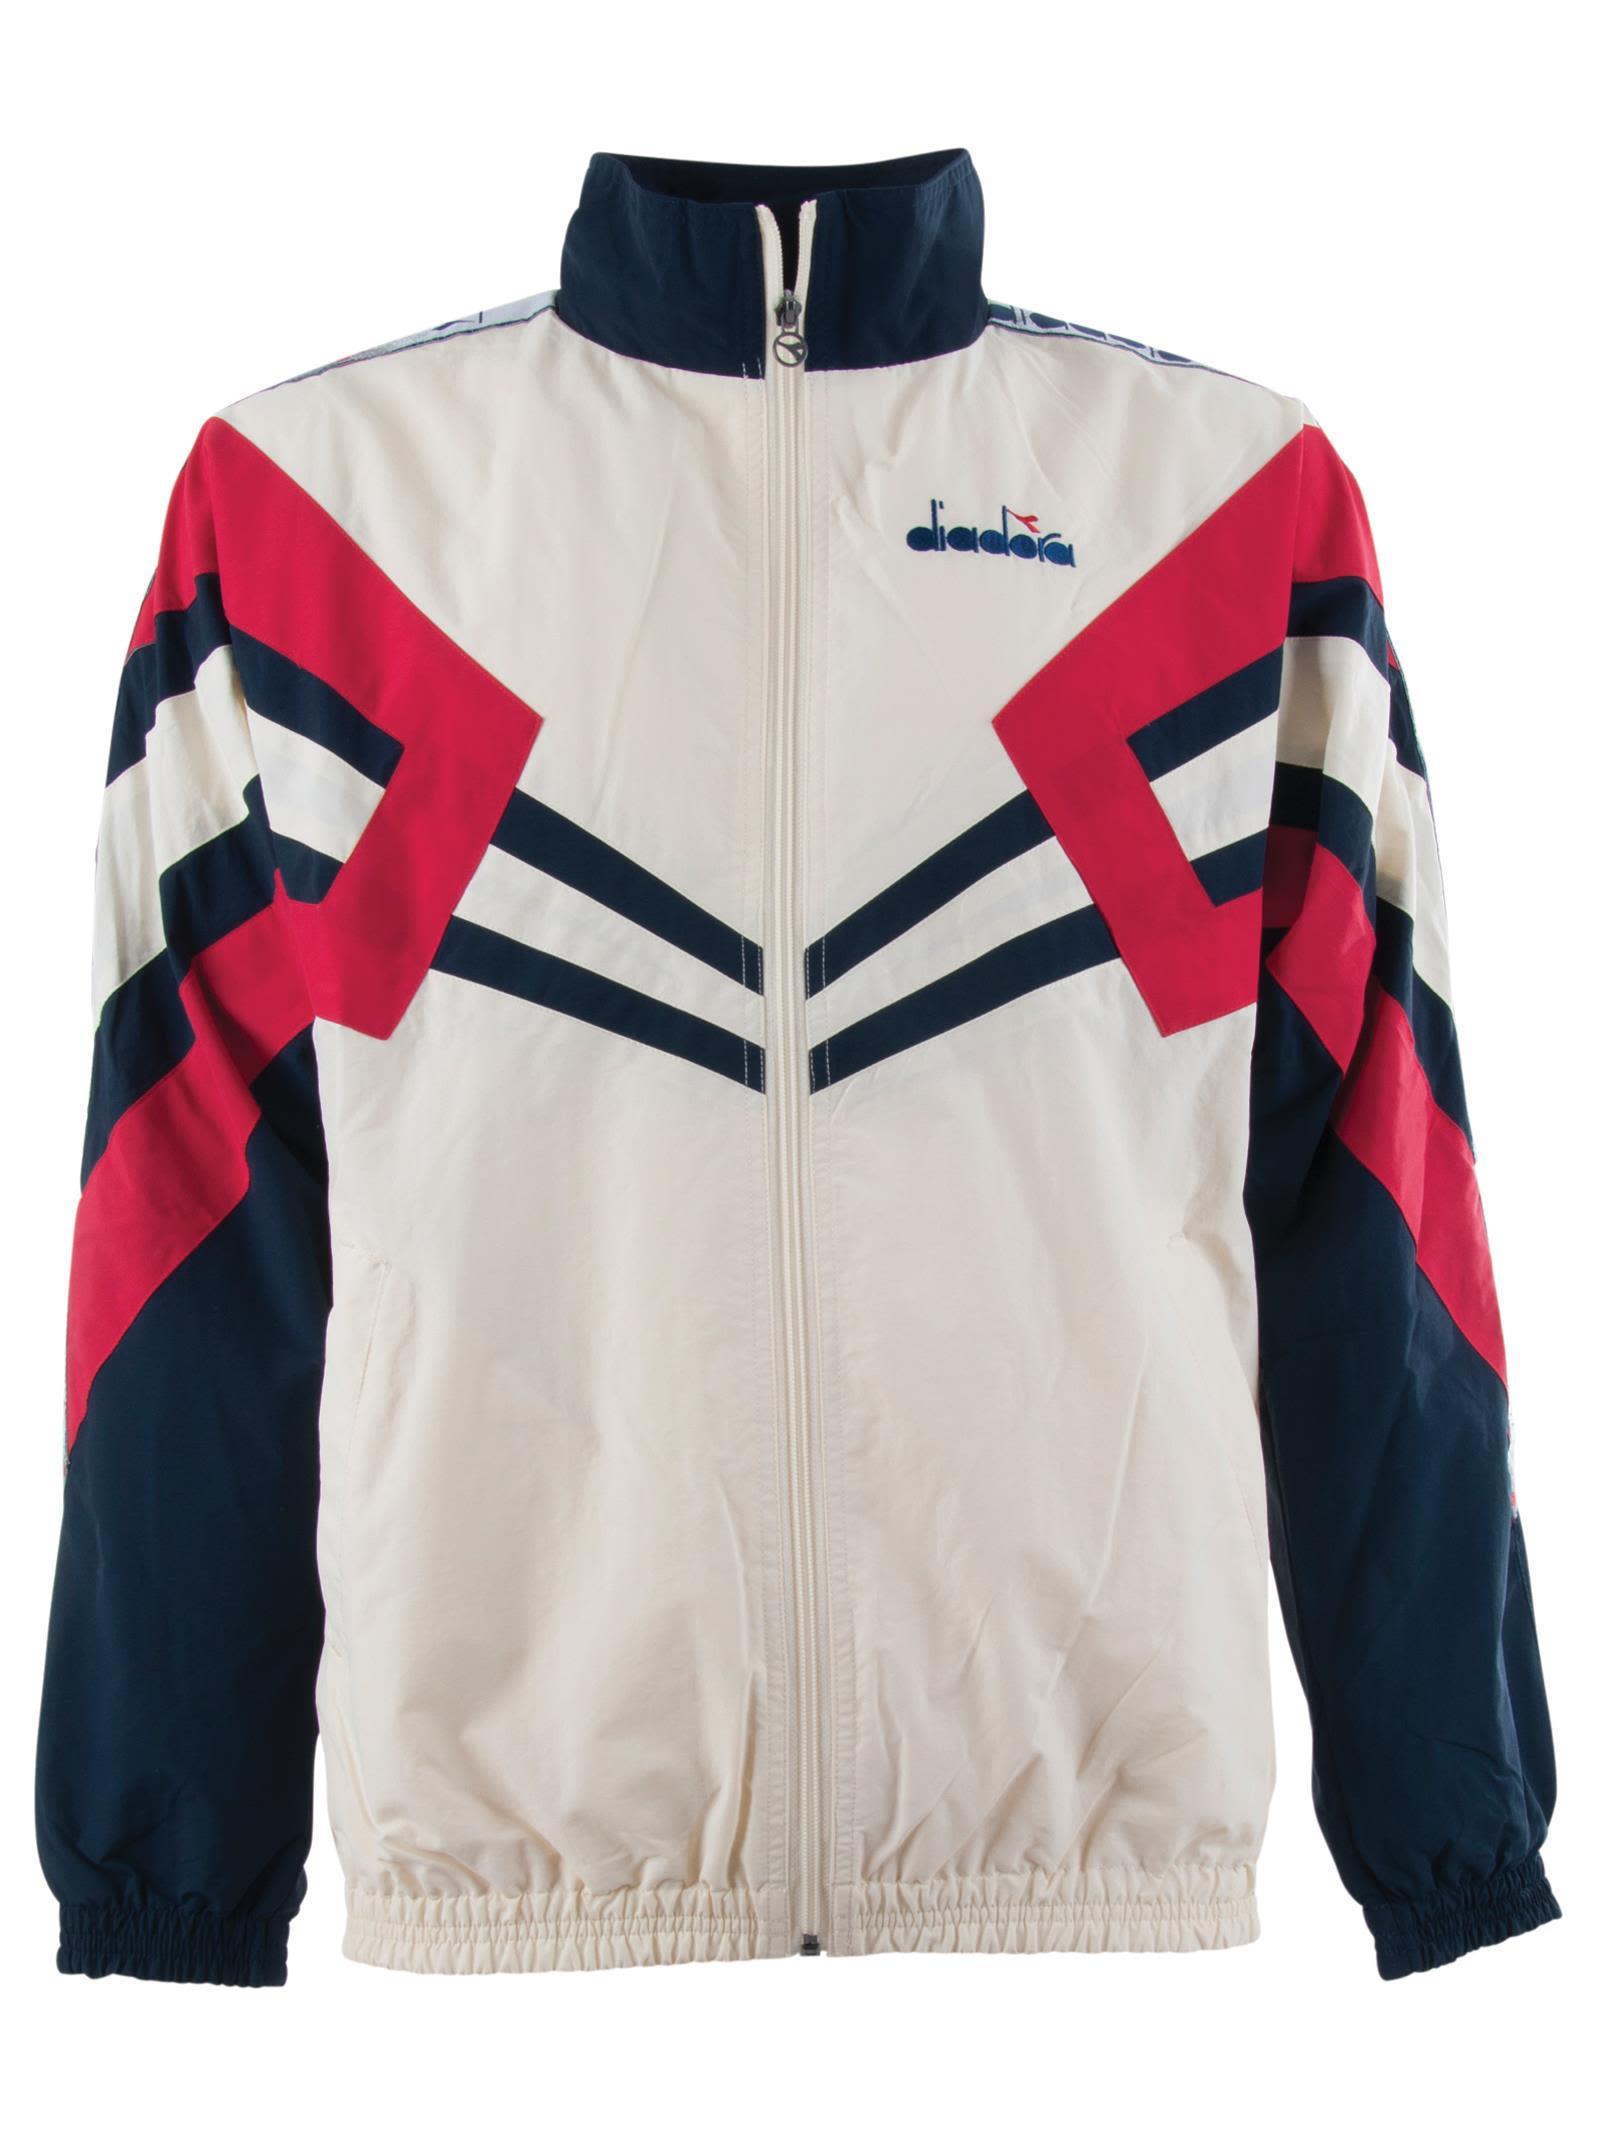 Diadora Track Jacket Mvb